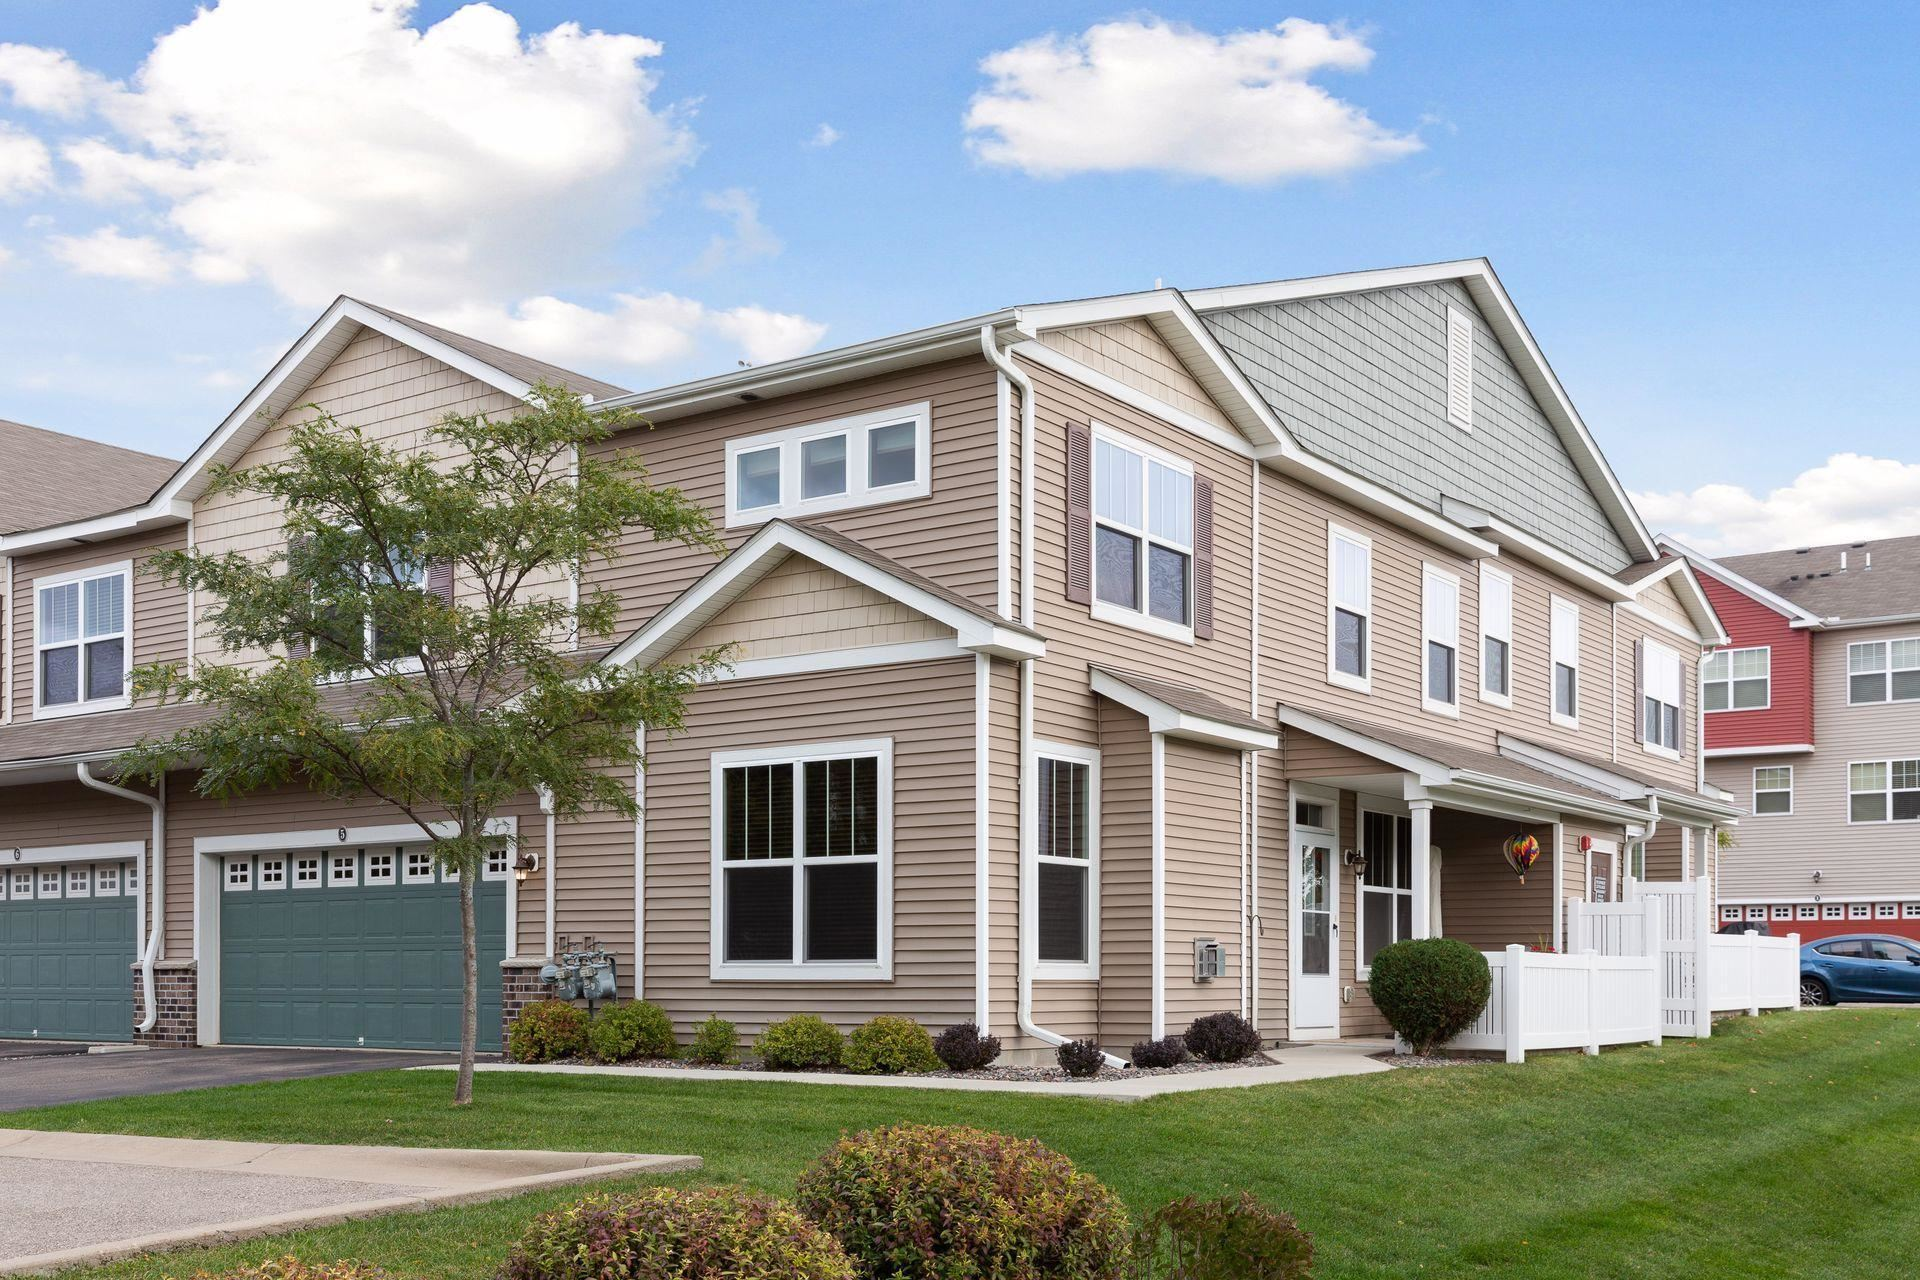 1826 Colonial Lane #5, Chanhassen, MN 55317 - MLS#: 5667611